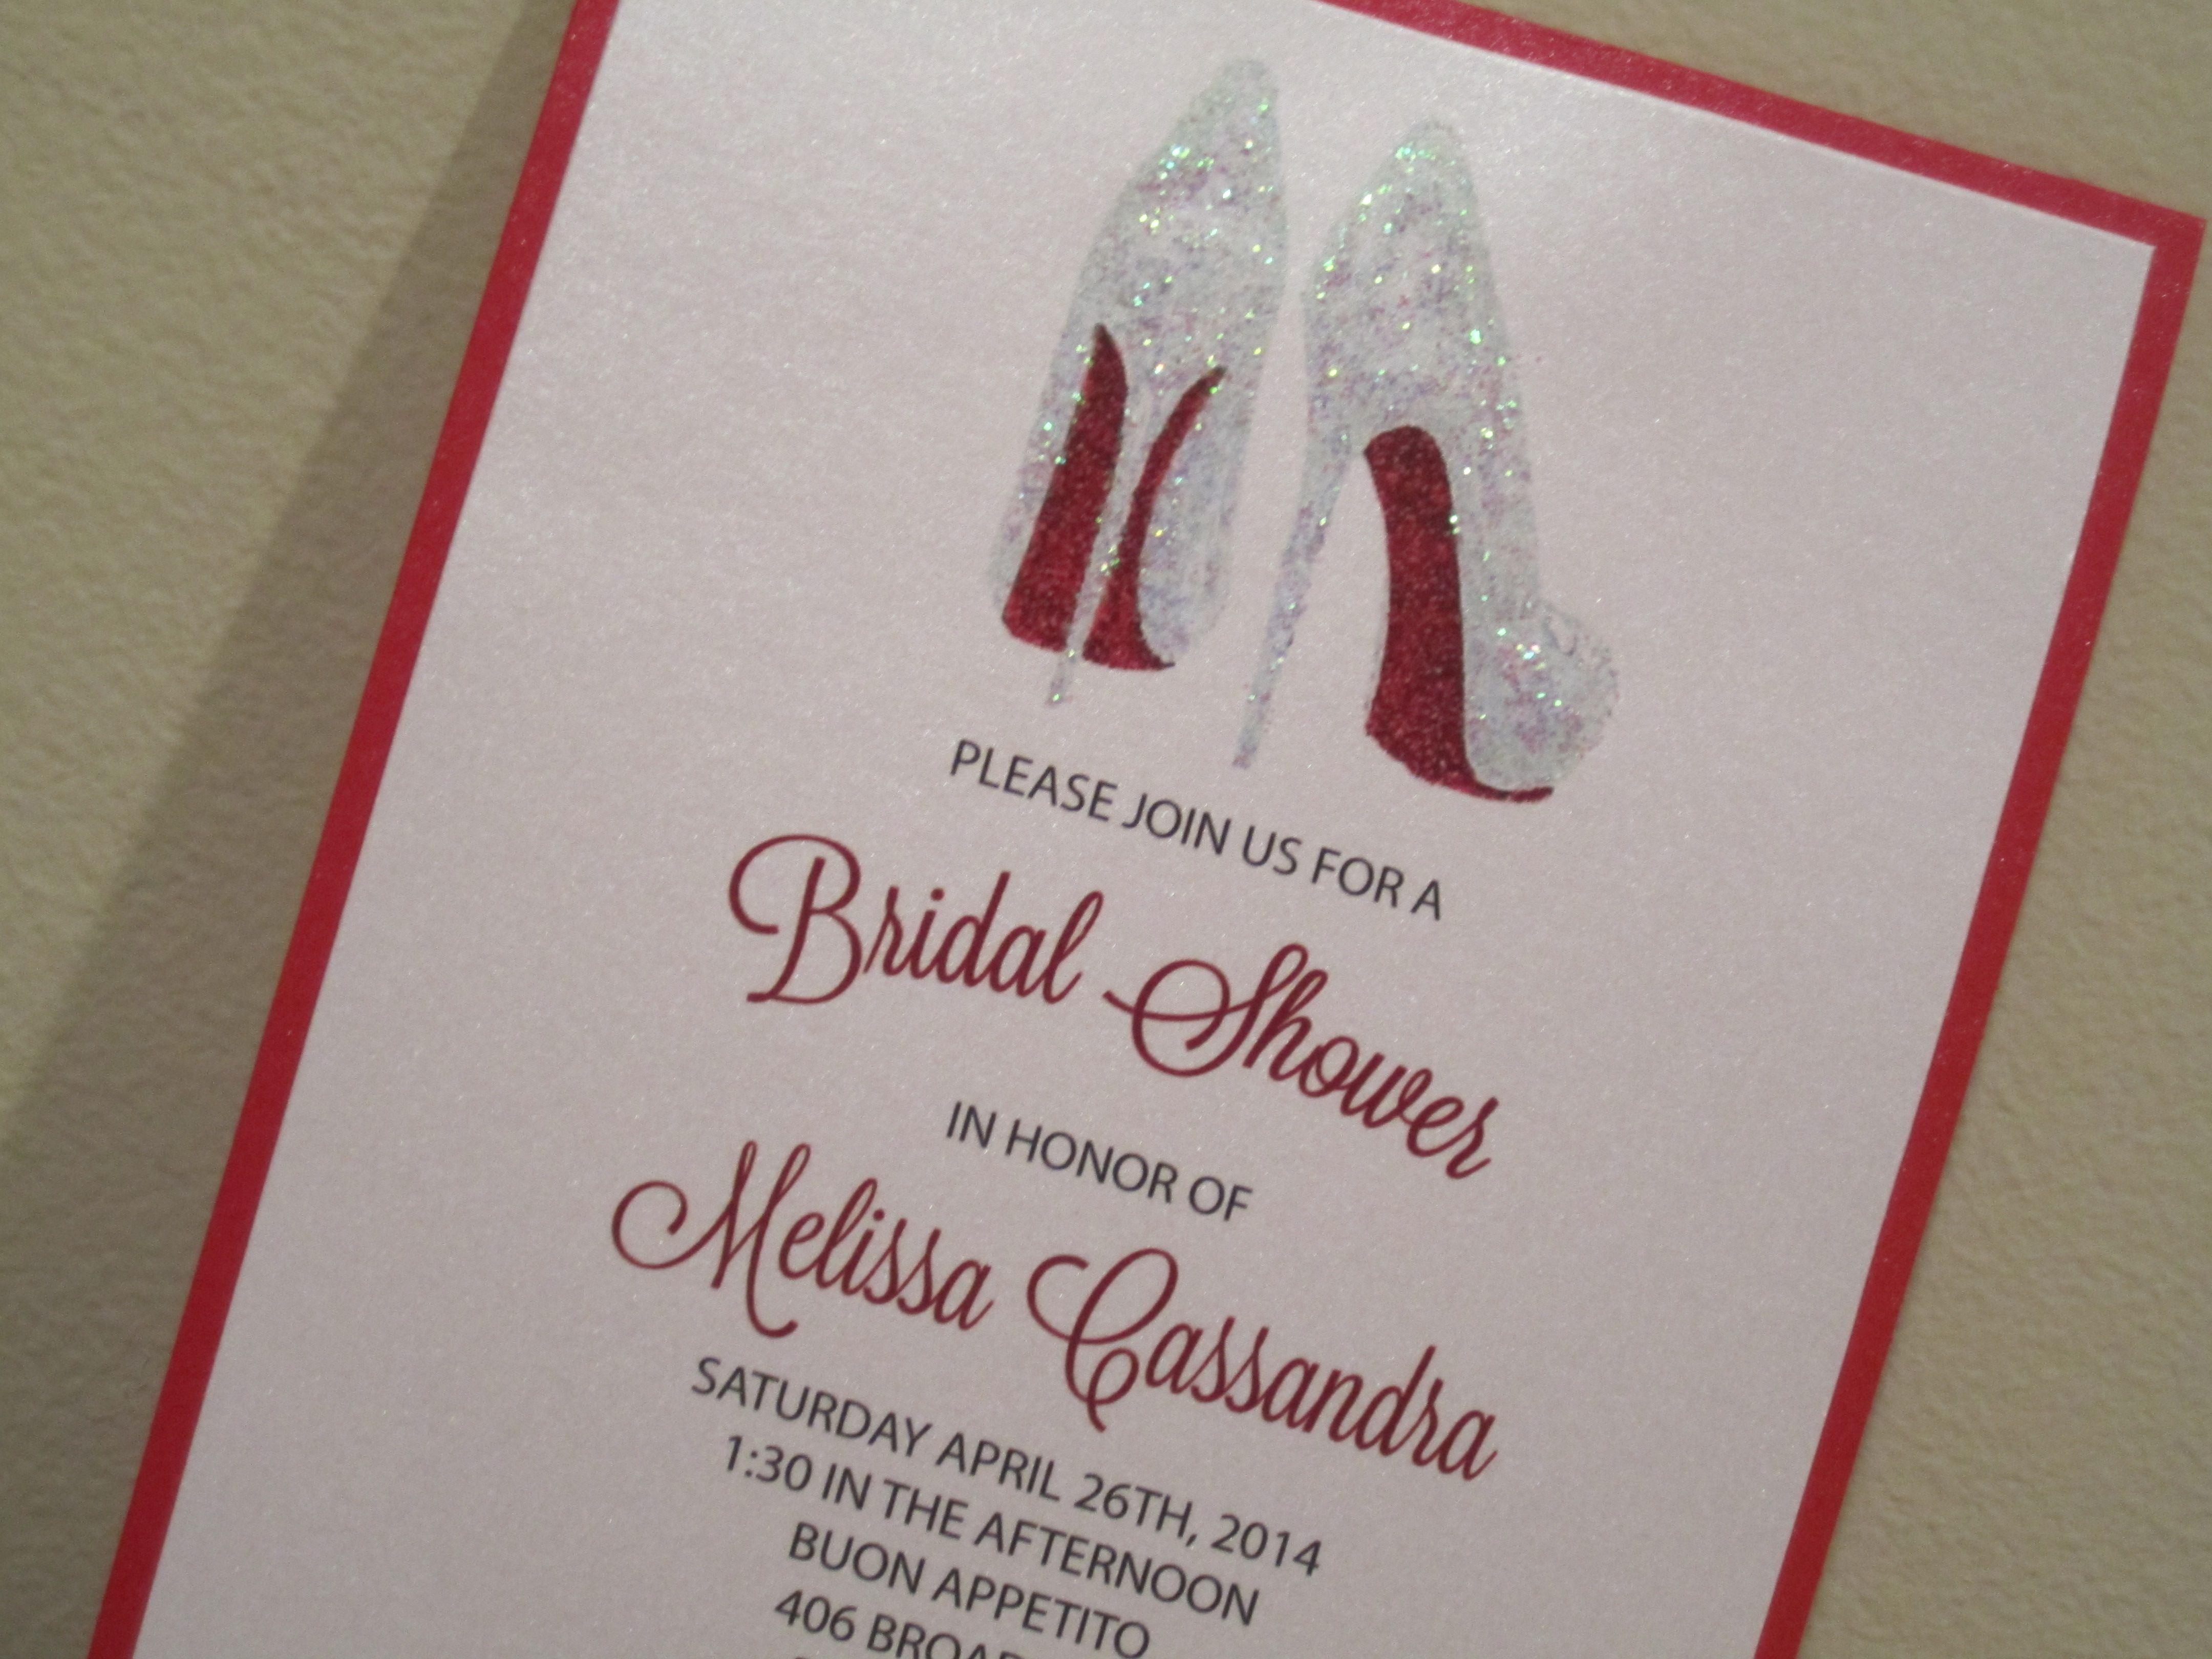 Bridal shower invitation shoe shower christian louboutin bridal shower invitation shoe shower christian louboutin inspired custom made at place of events filmwisefo Images